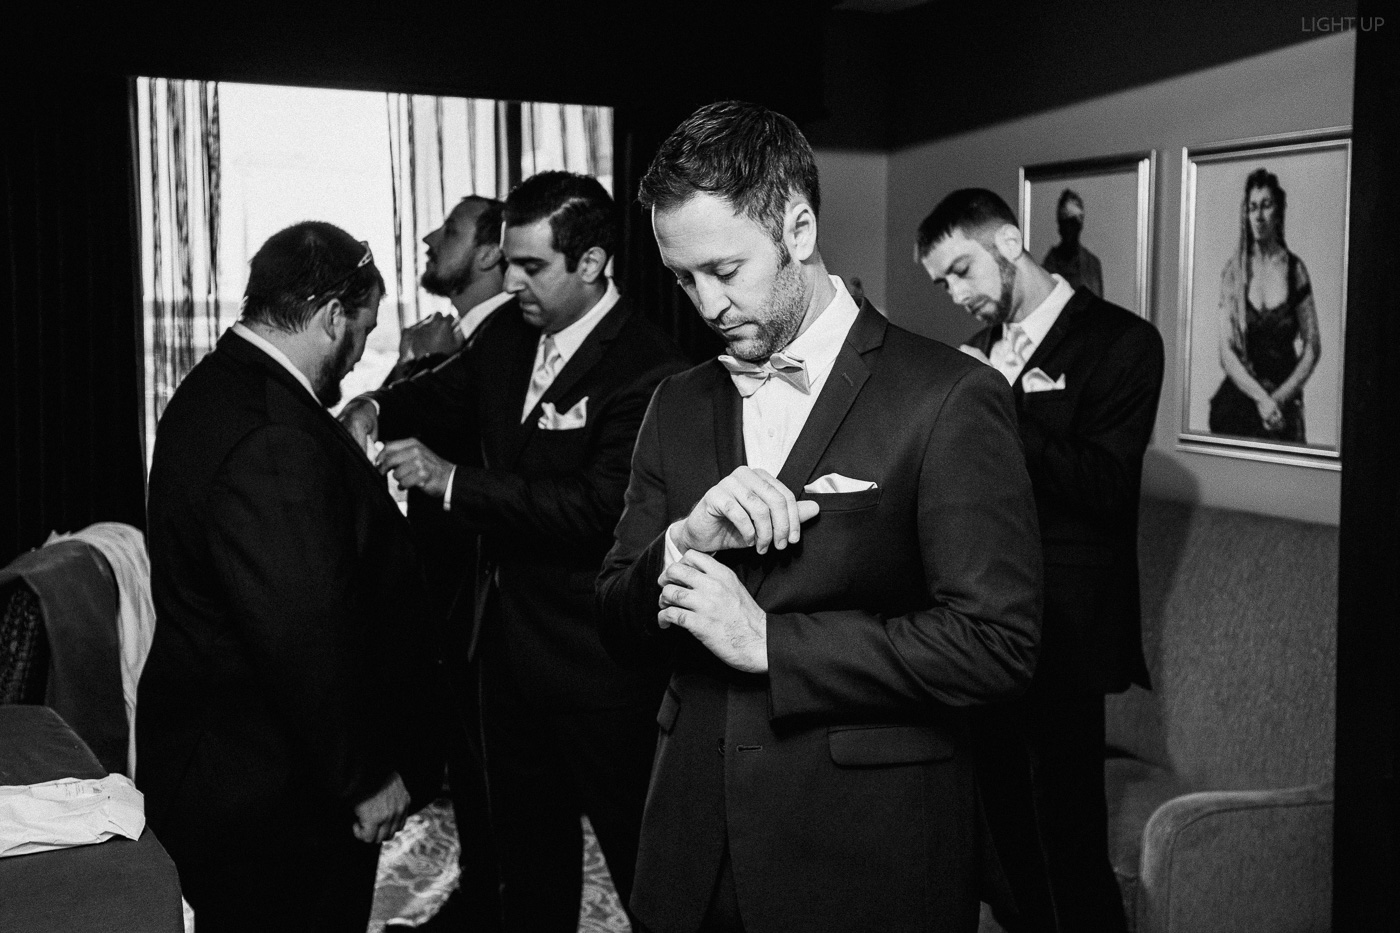 Grand-Bohemian-Hotel-Wedding-in-Orlando-21.jpg